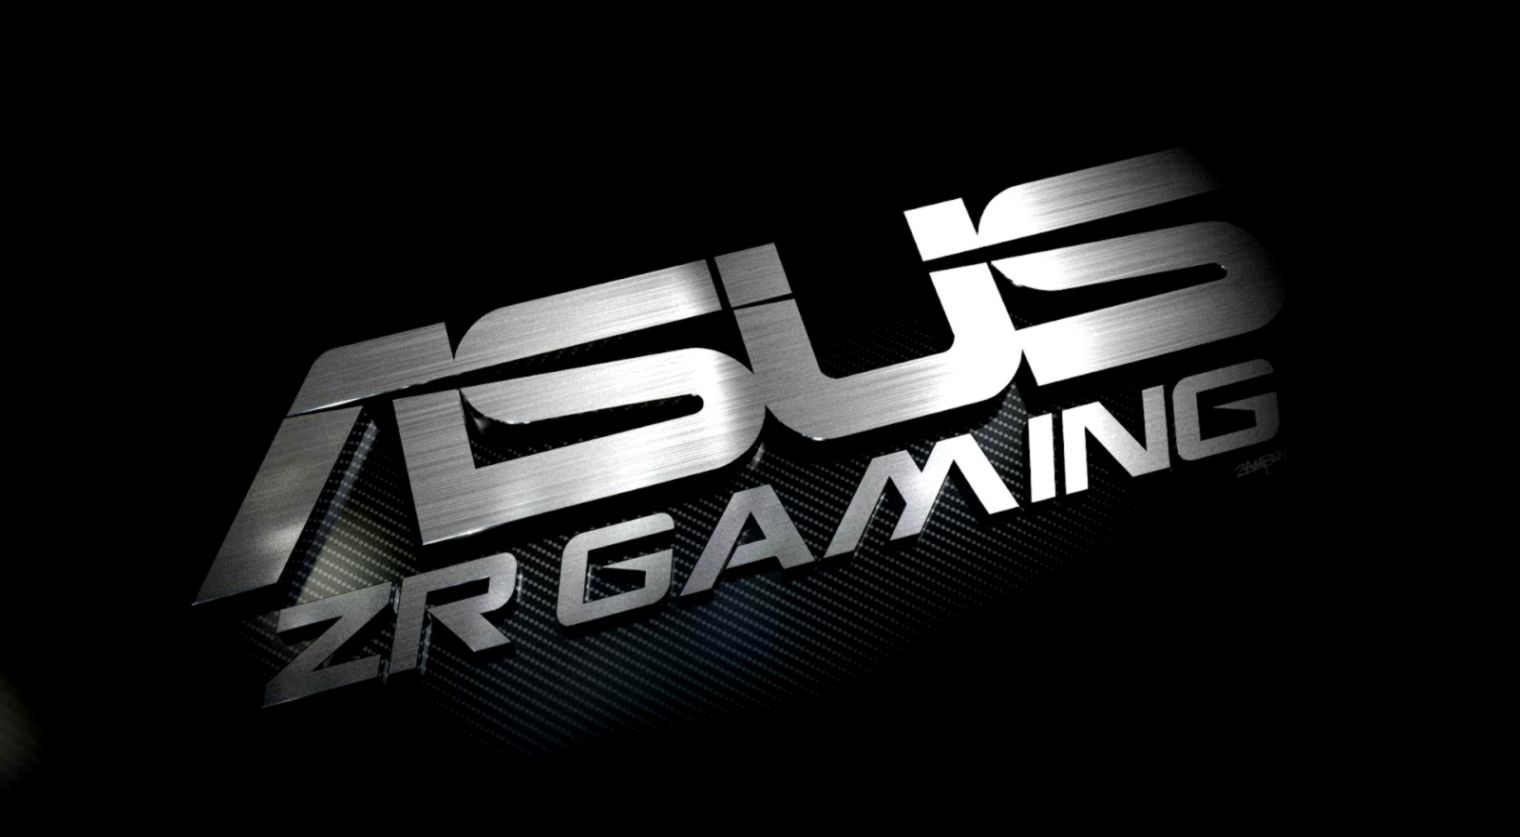 Asus republic of game logo hd wallpaper wallpaper gallery - Gaming logo wallpaper ...